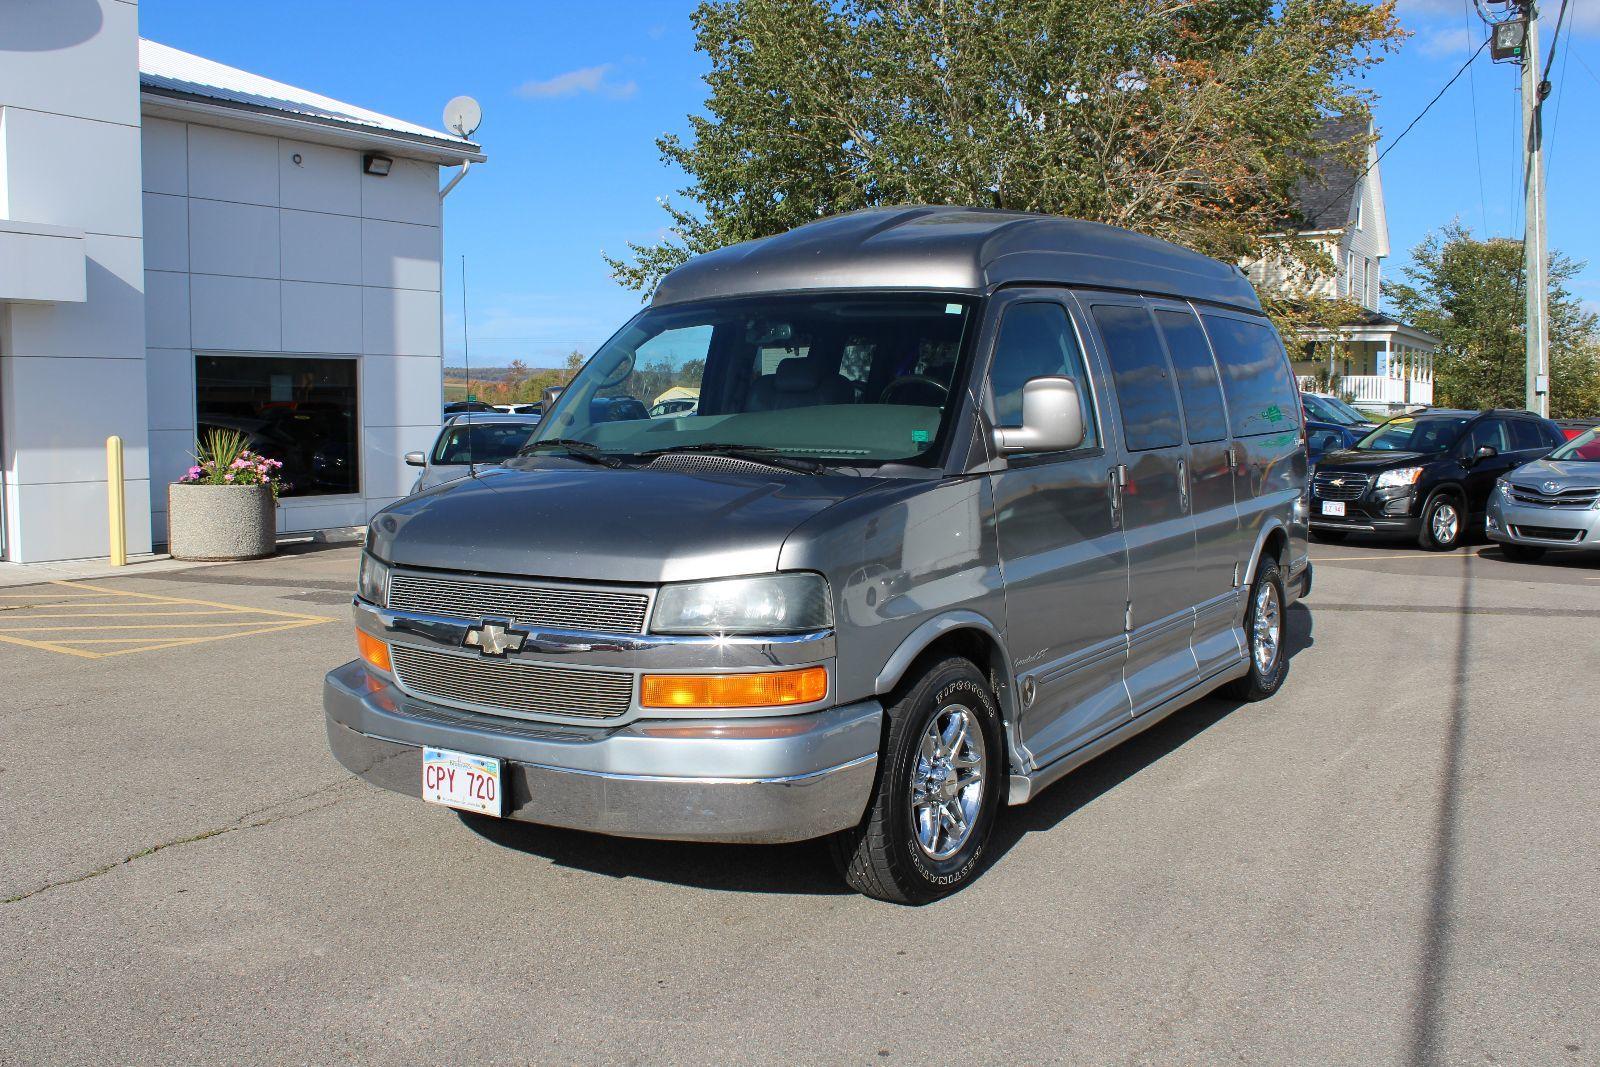 used 2006 chevrolet express cargo van yf7 upfitter in saint john used inventory downey ford. Black Bedroom Furniture Sets. Home Design Ideas